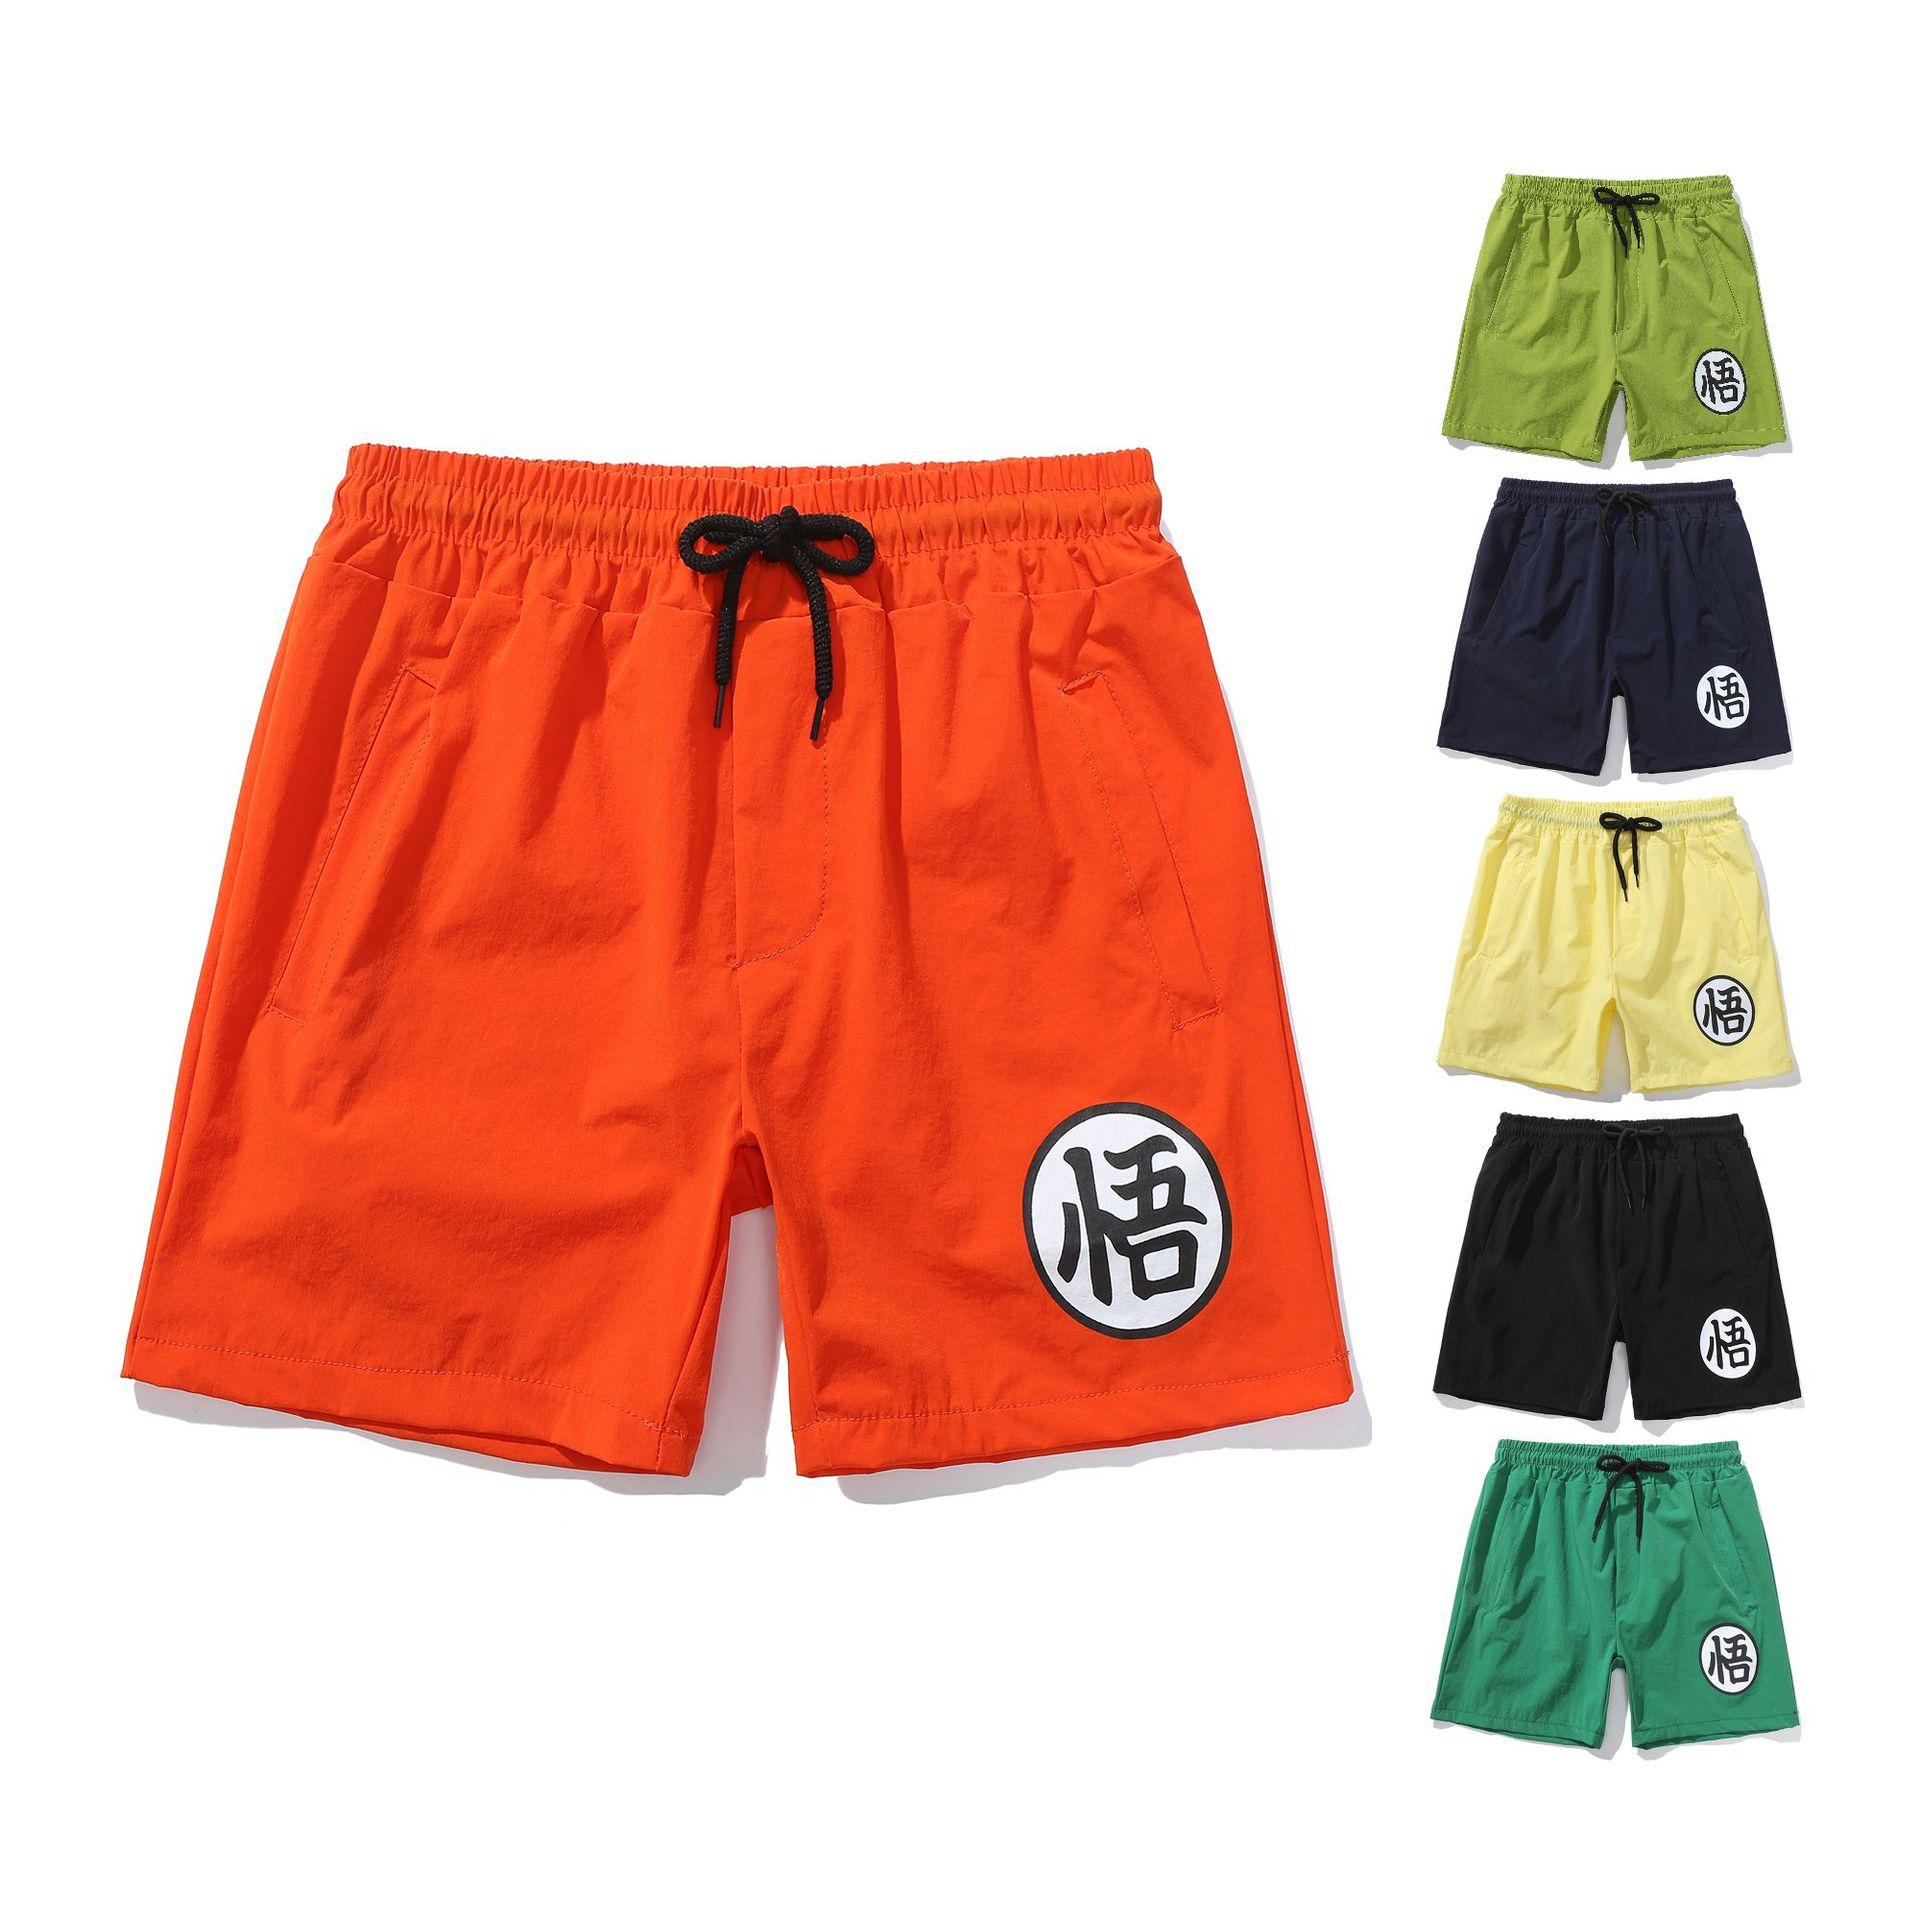 Eaby Summer Men's Hot Selling Dragon Ball Goku Casual Sports Pants With Drawstring Shorts